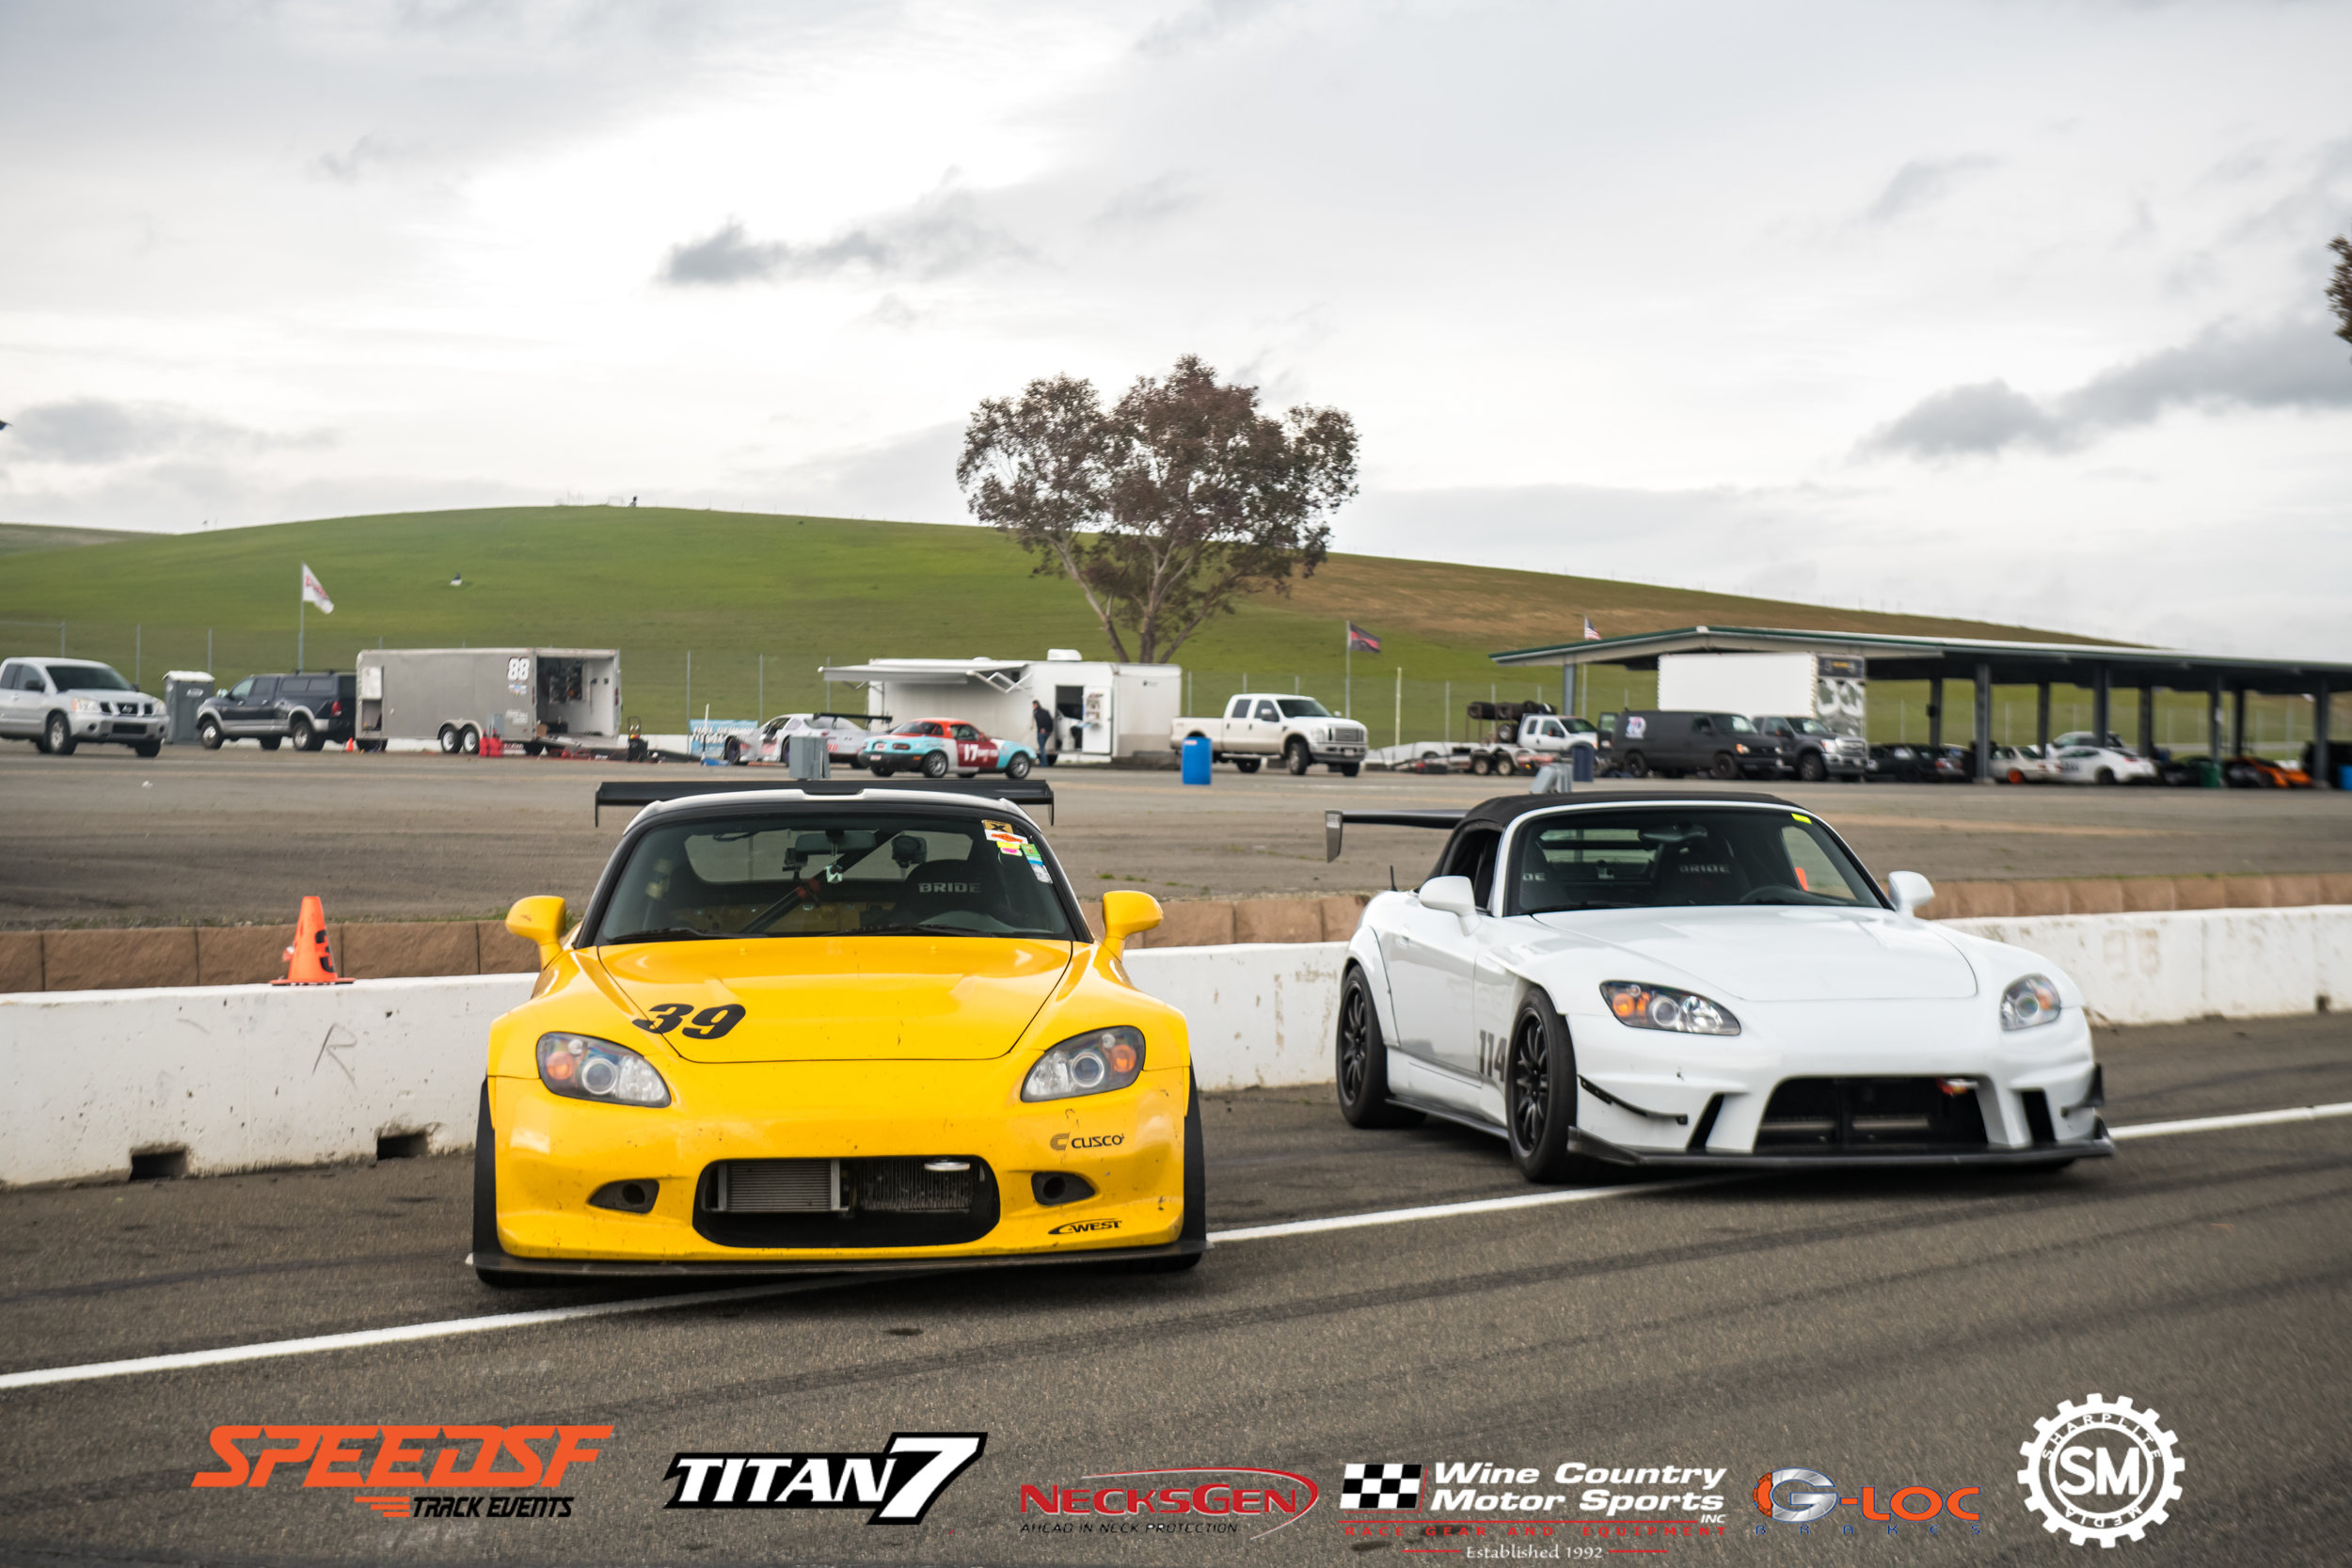 SpeedSF Thunderhill Sunday 02_24_2019-28.jpg